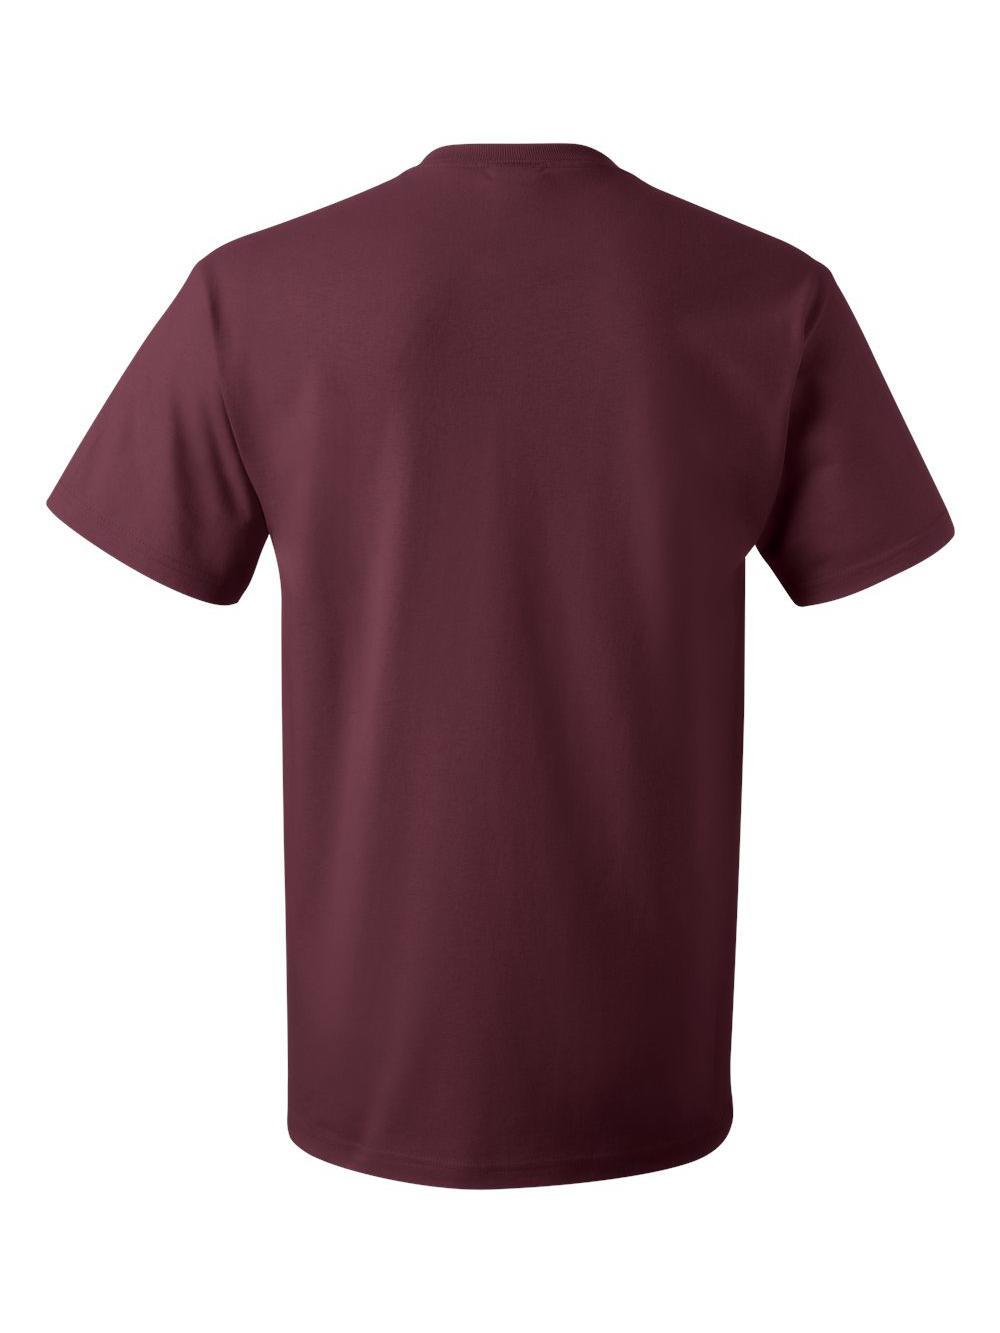 Fruit-of-the-Loom-HD-Cotton-Short-Sleeve-T-Shirt-3930R thumbnail 76